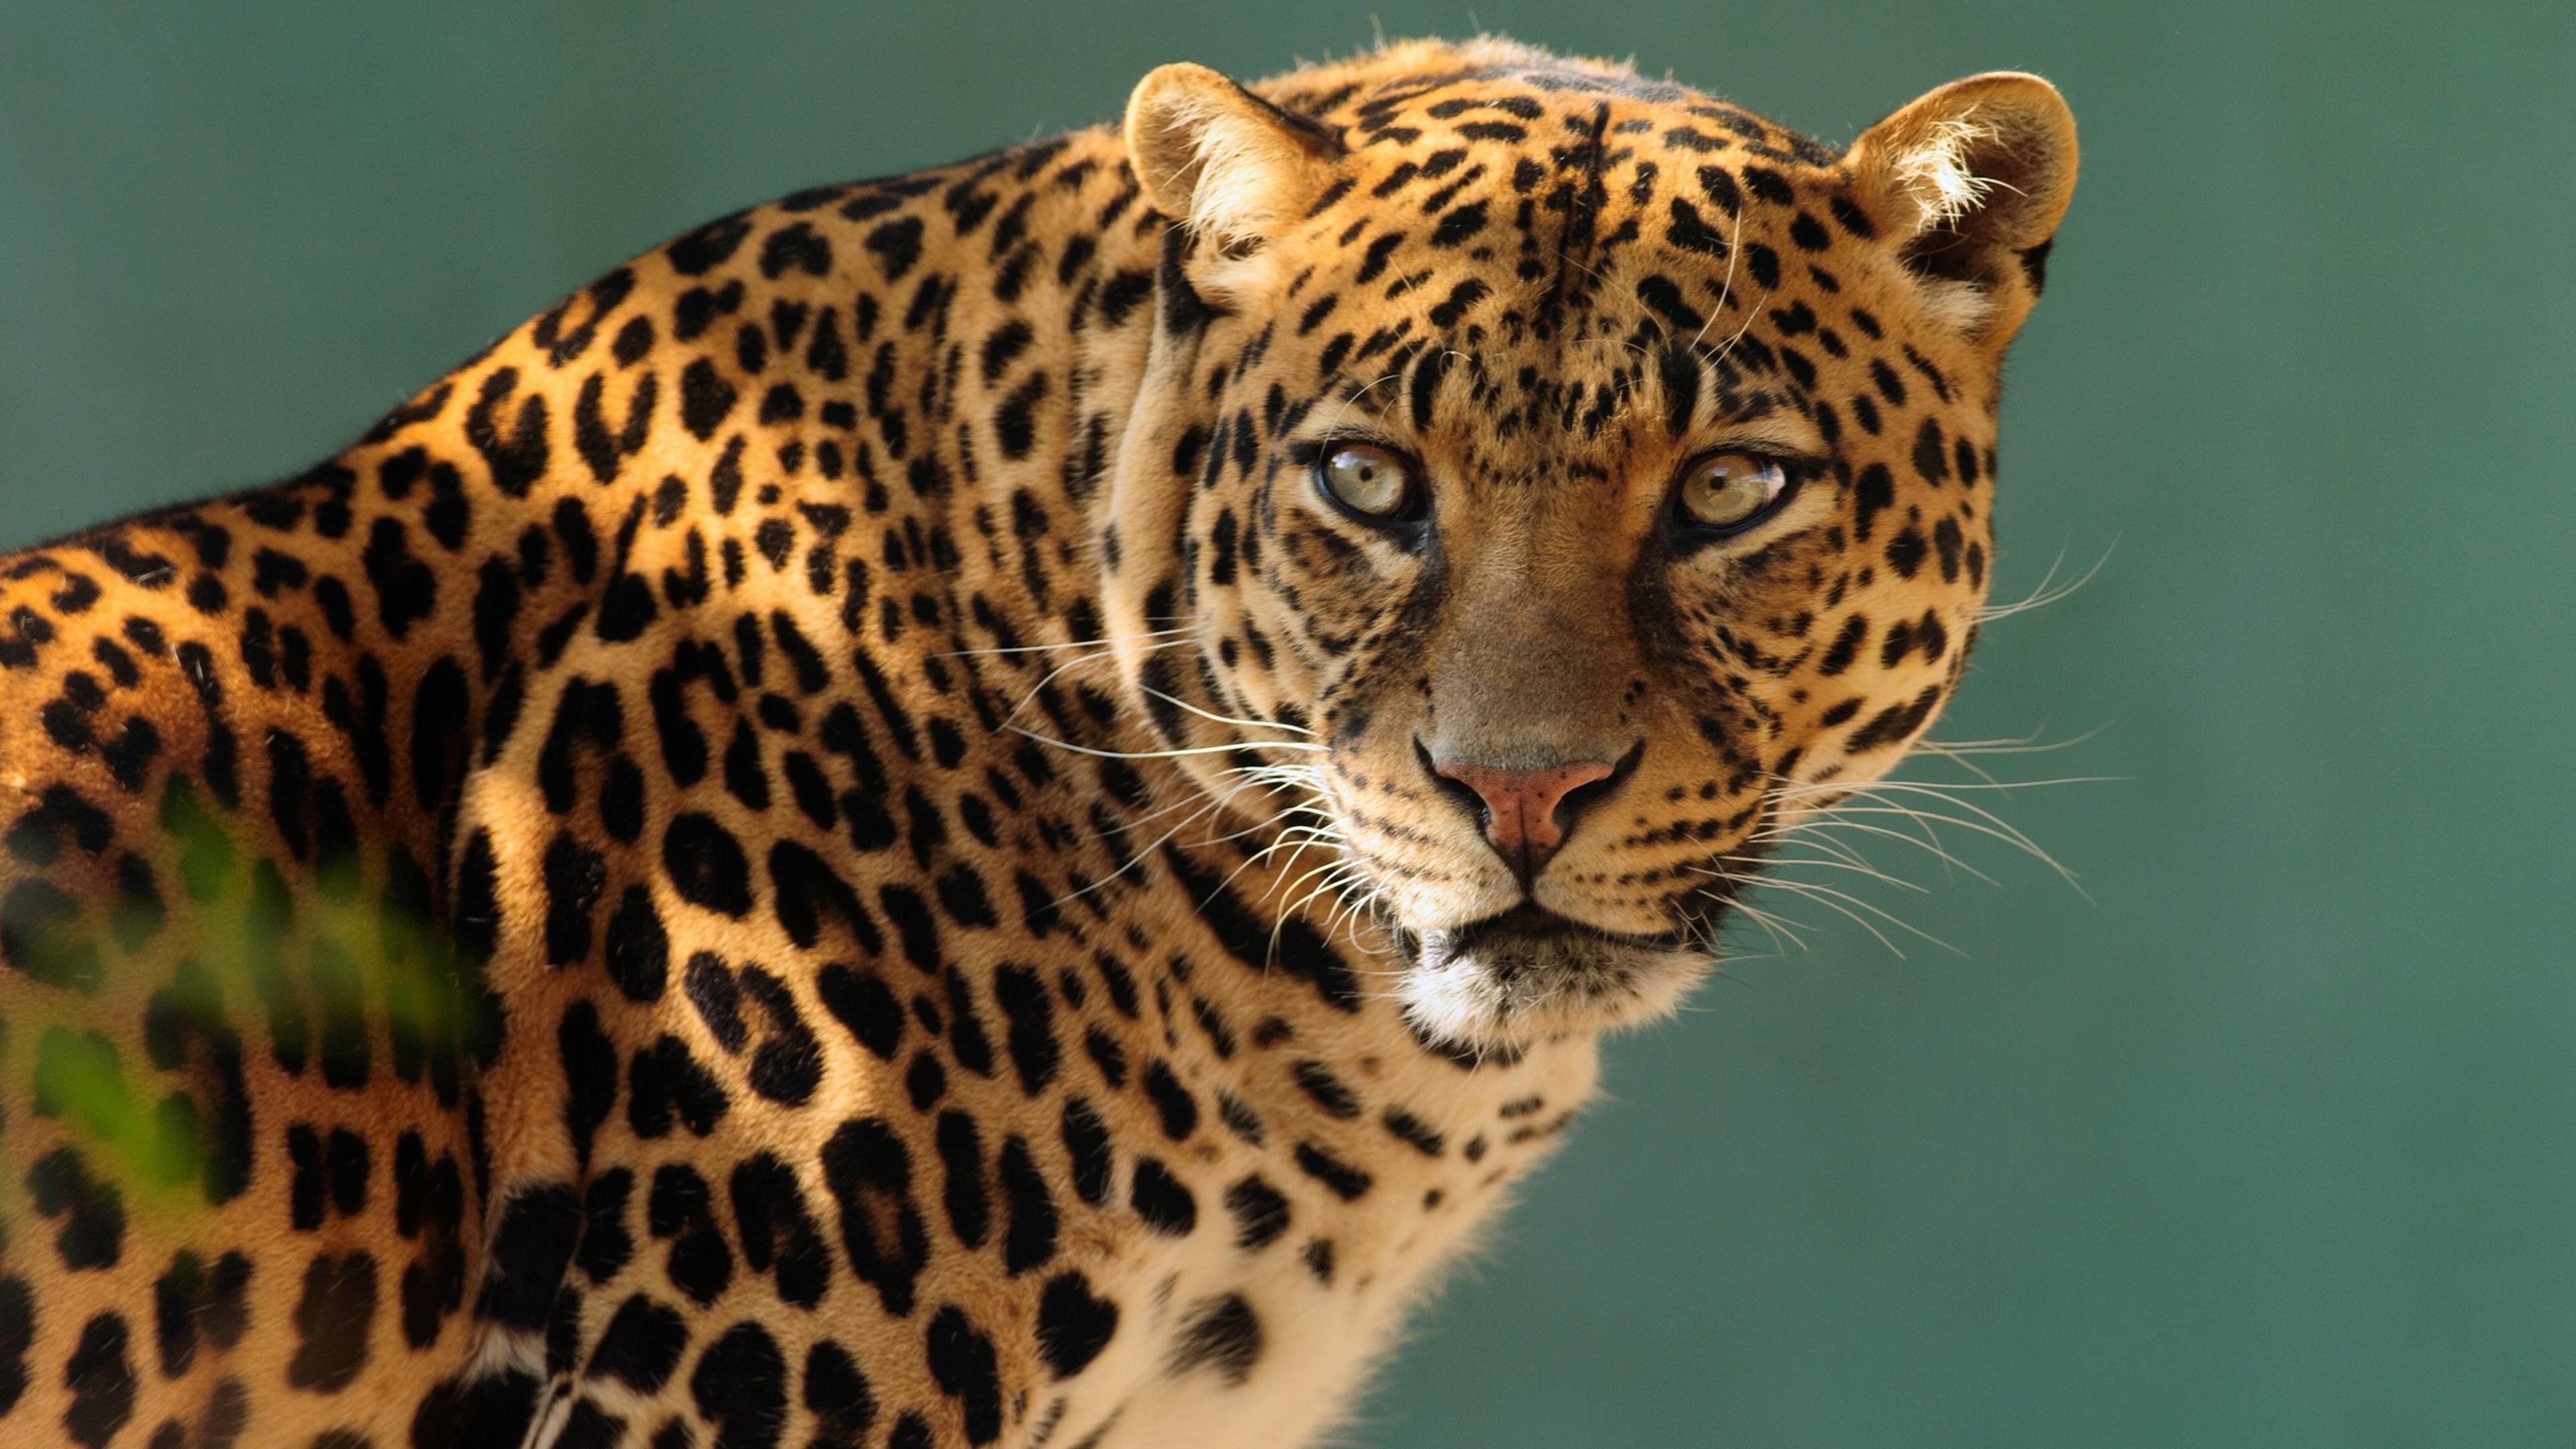 Jaguar Animal Wallpaper Wallpaper Jaguar Wild Cat Face Animals 10237